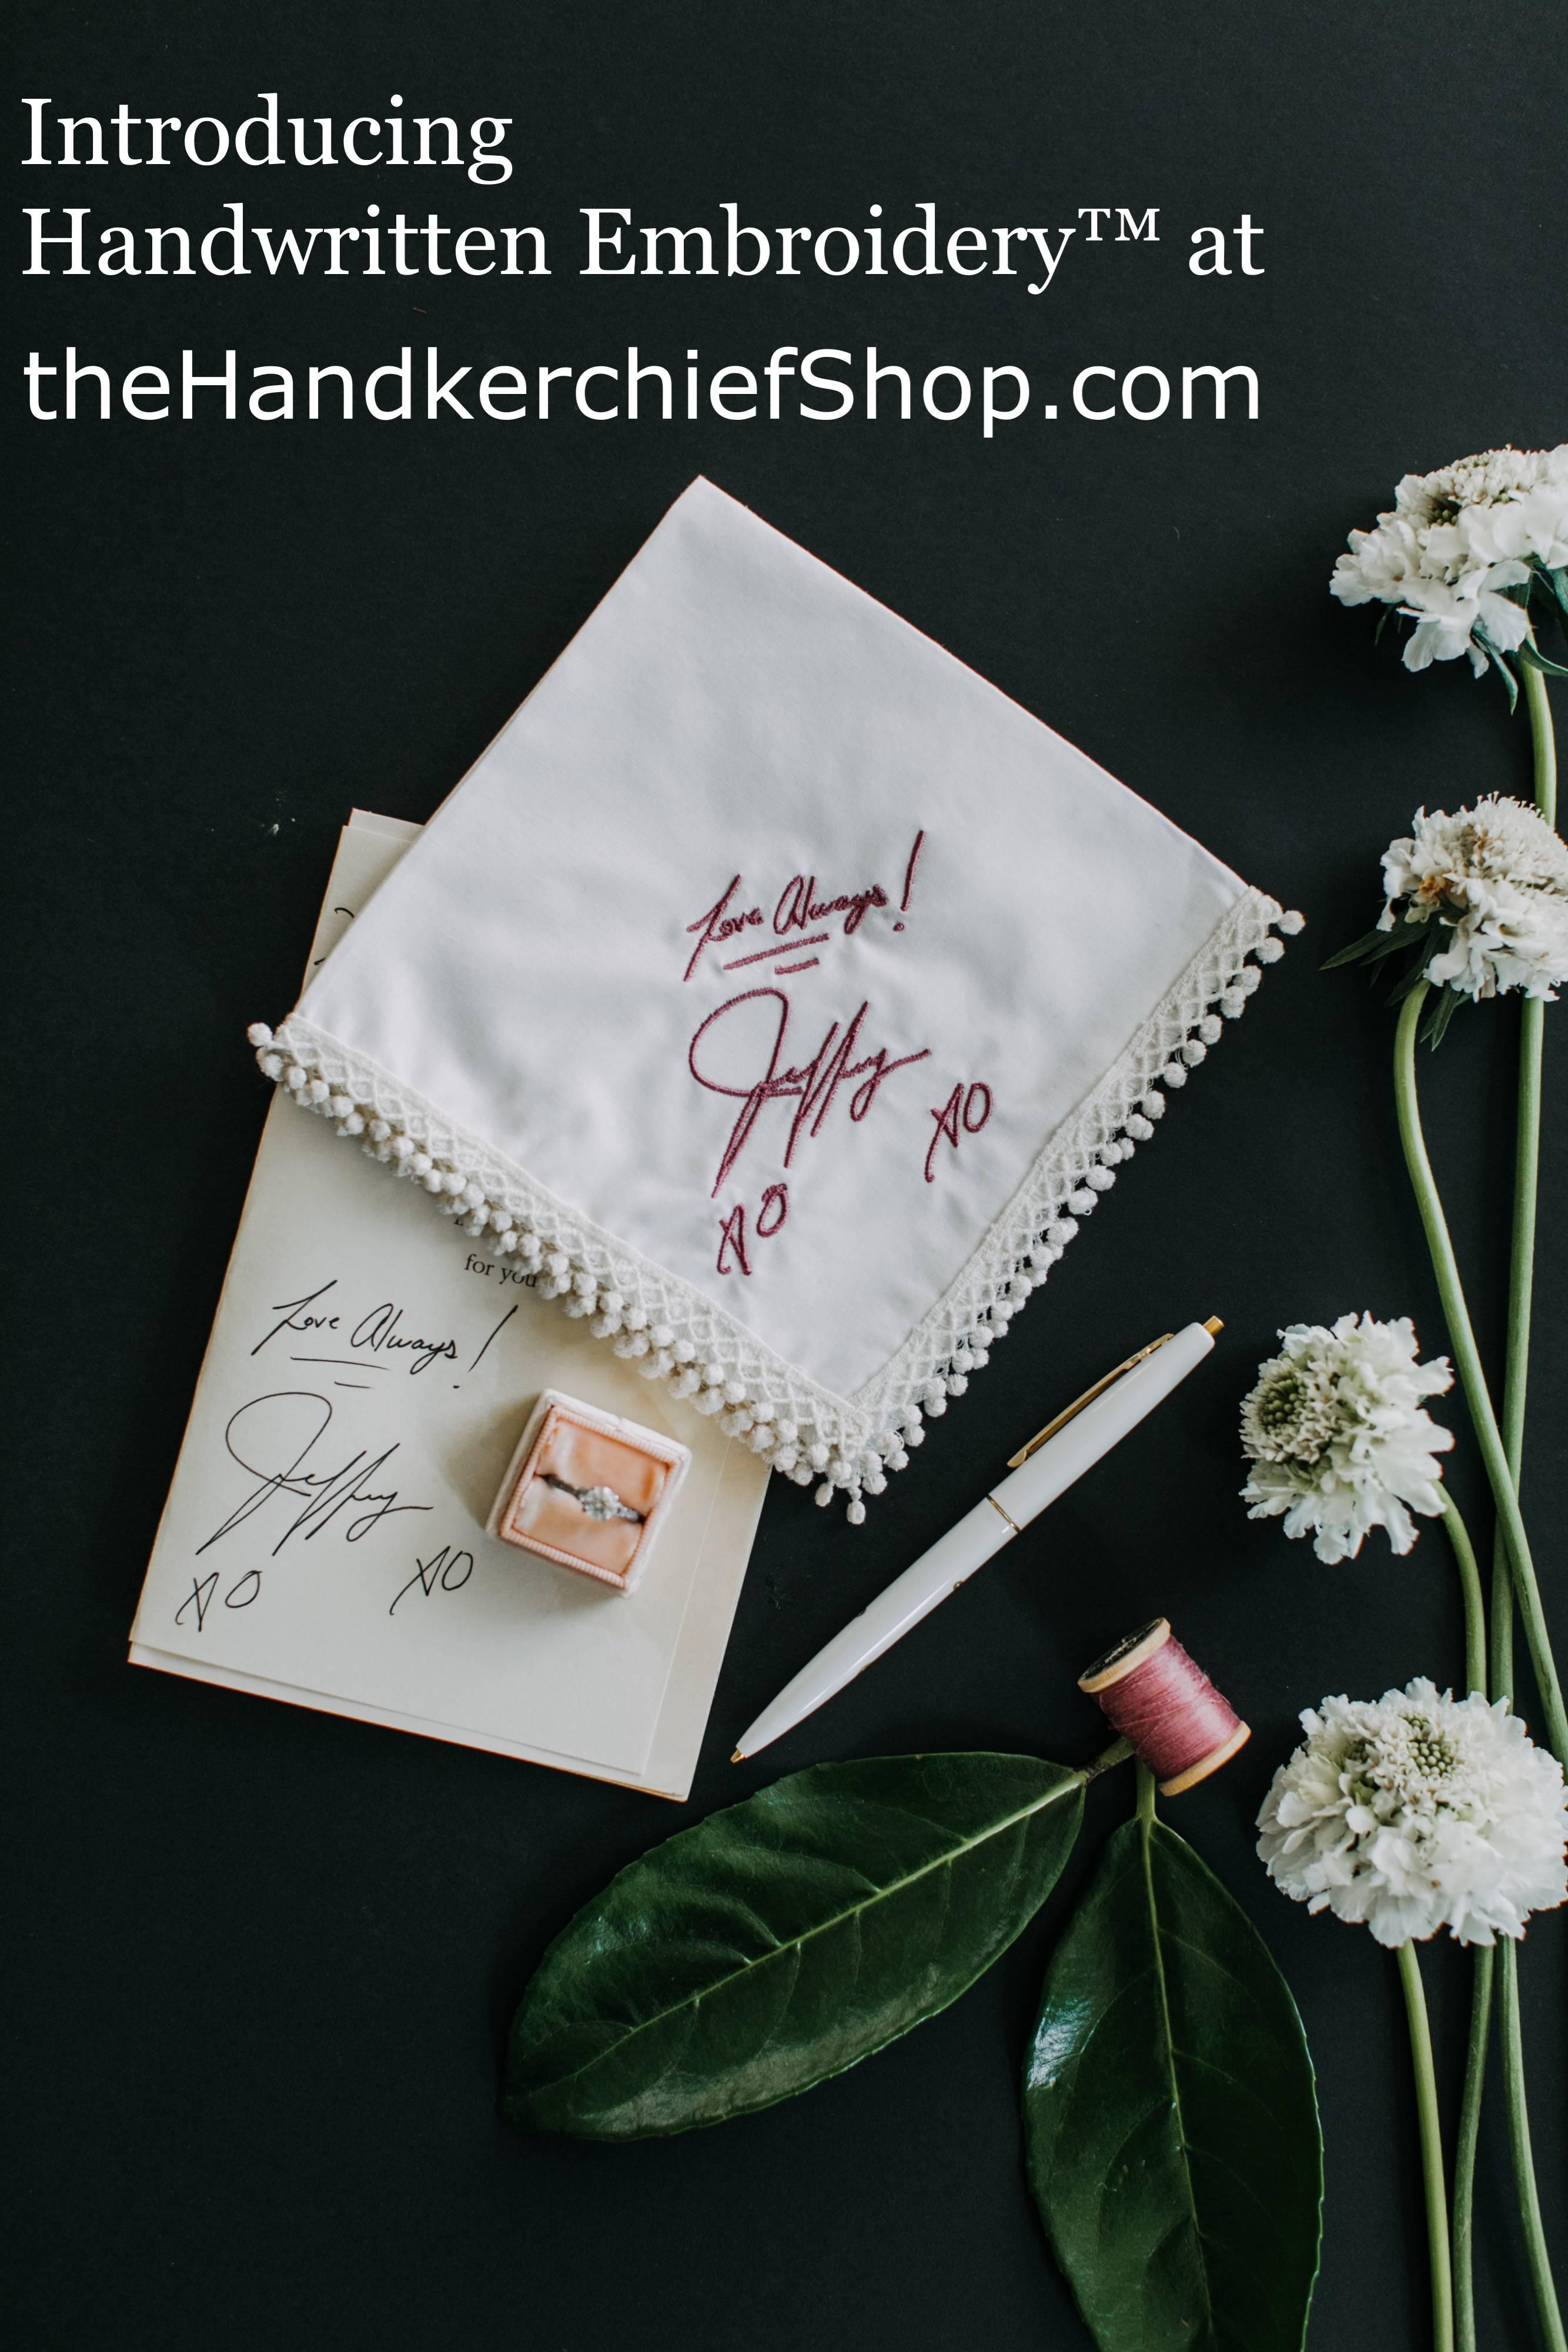 Handwritten Embroidery at The Handkerchief Shop